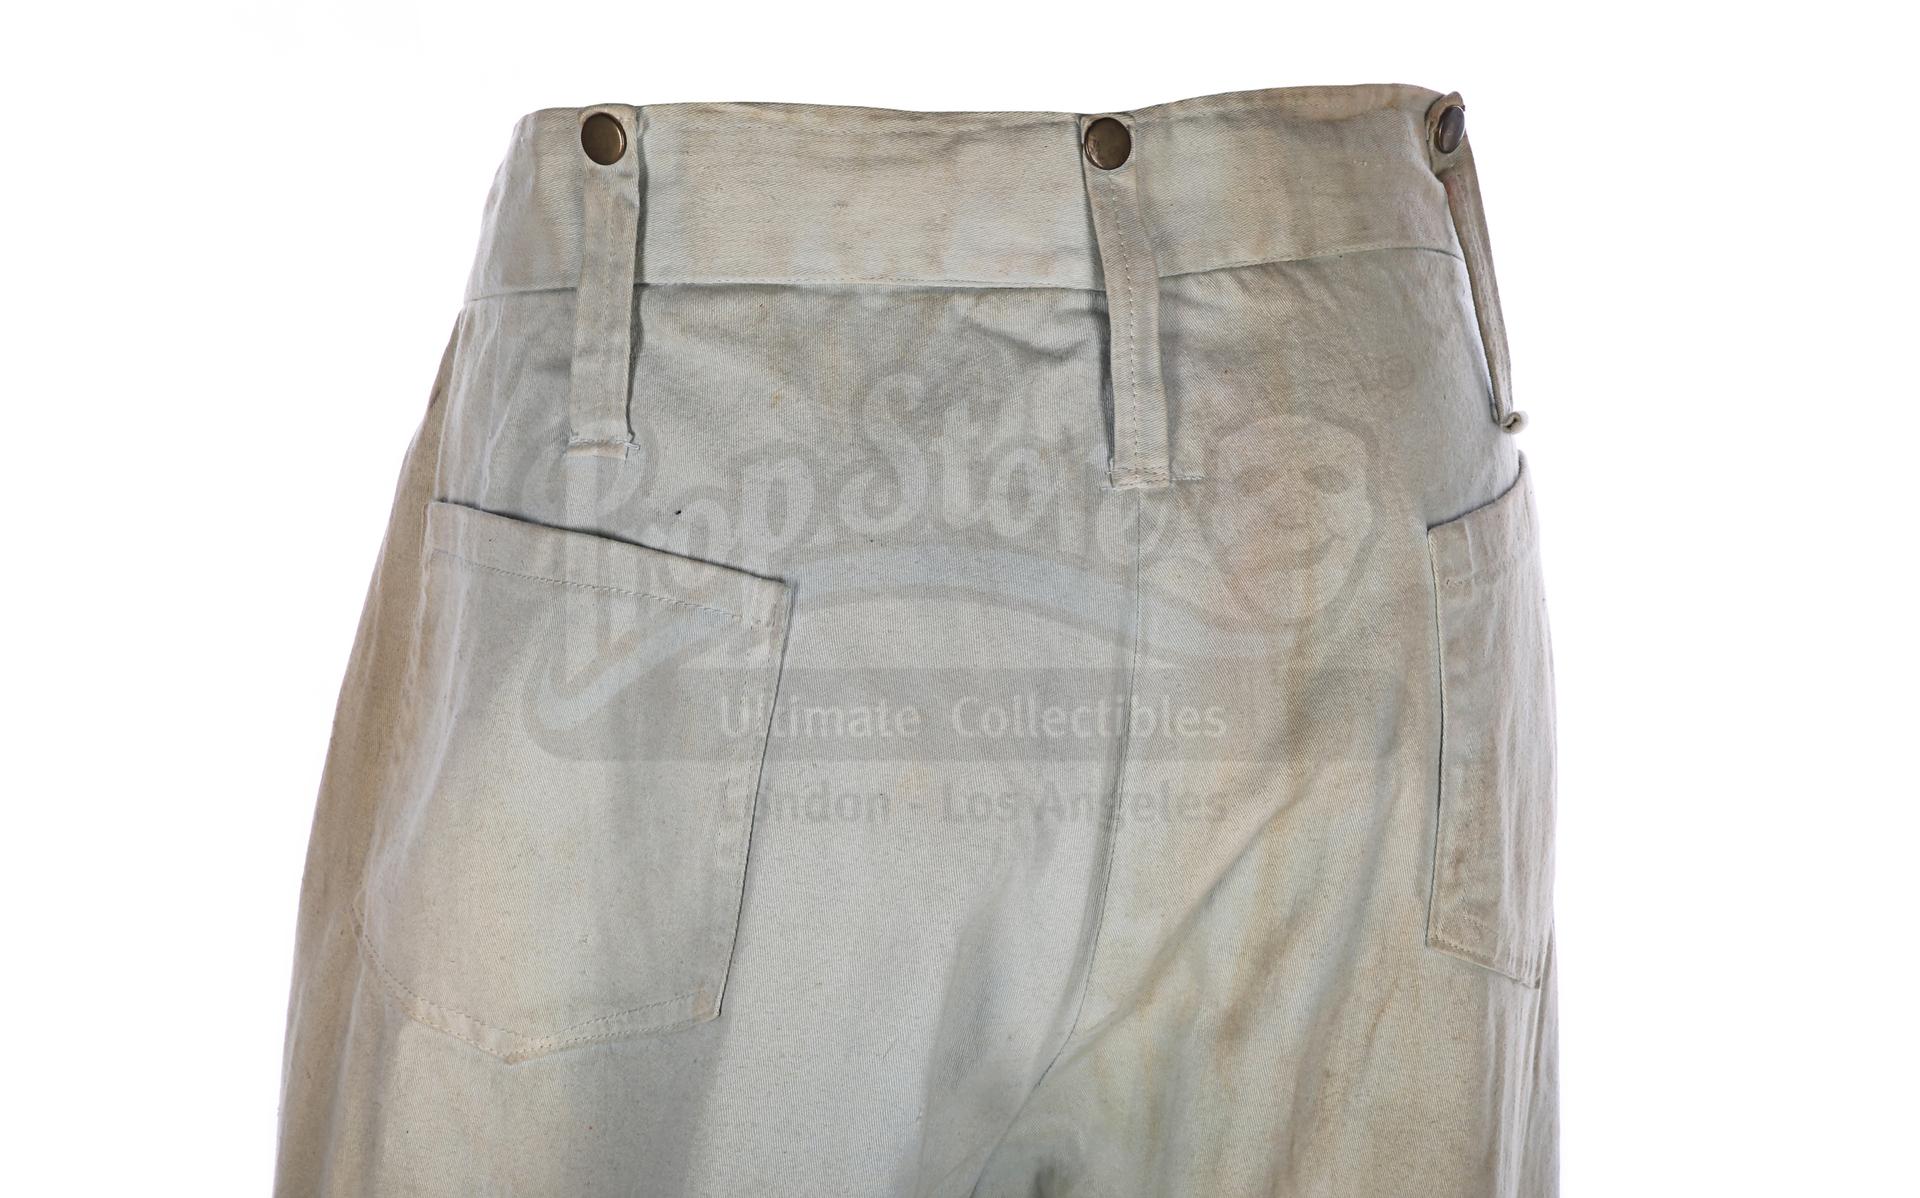 ALIEN (1979) - Nostromo Crew Trousers - Image 5 of 9